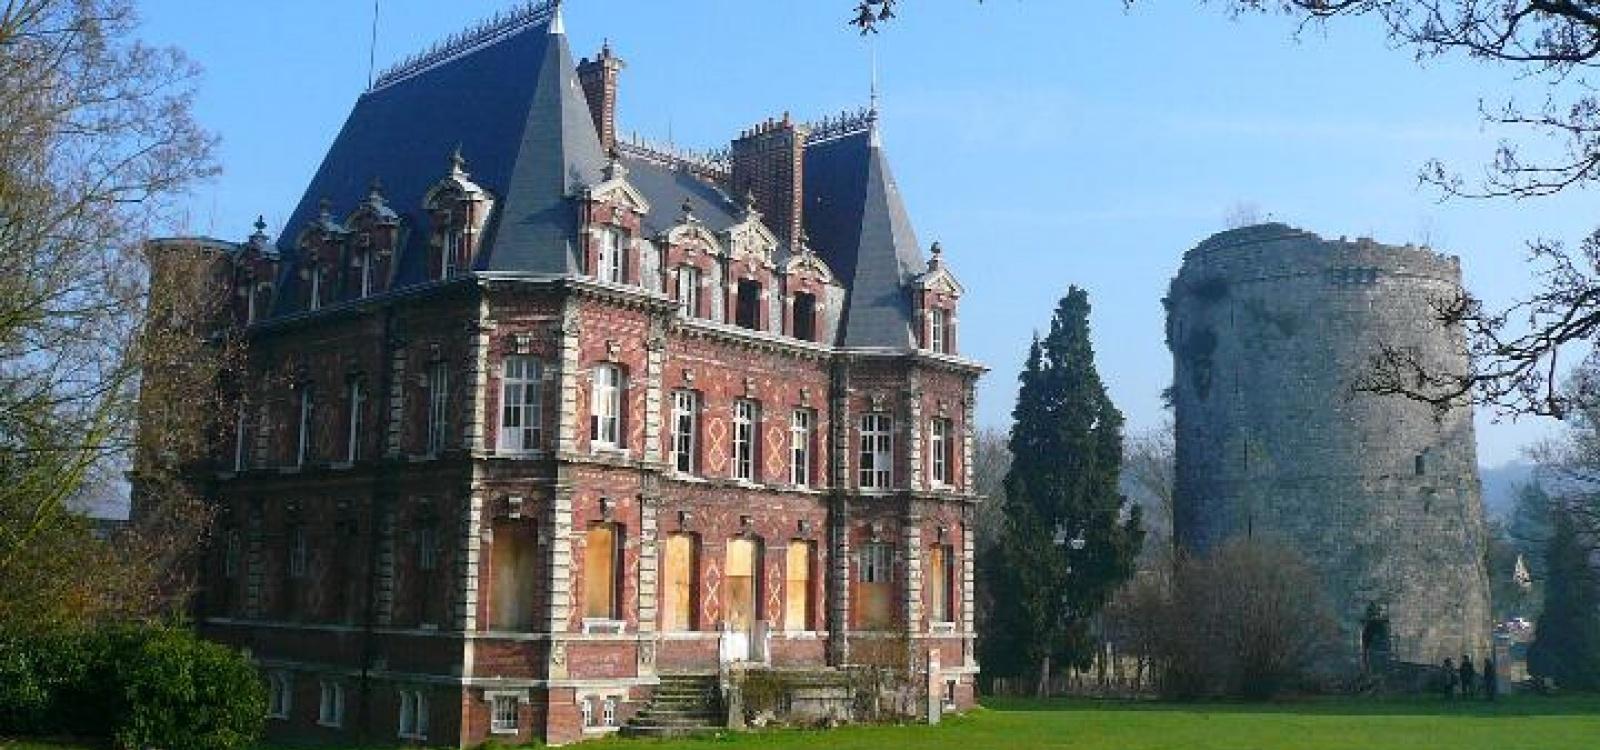 Lillebonne,Seine-Maritime,France,Château,1056